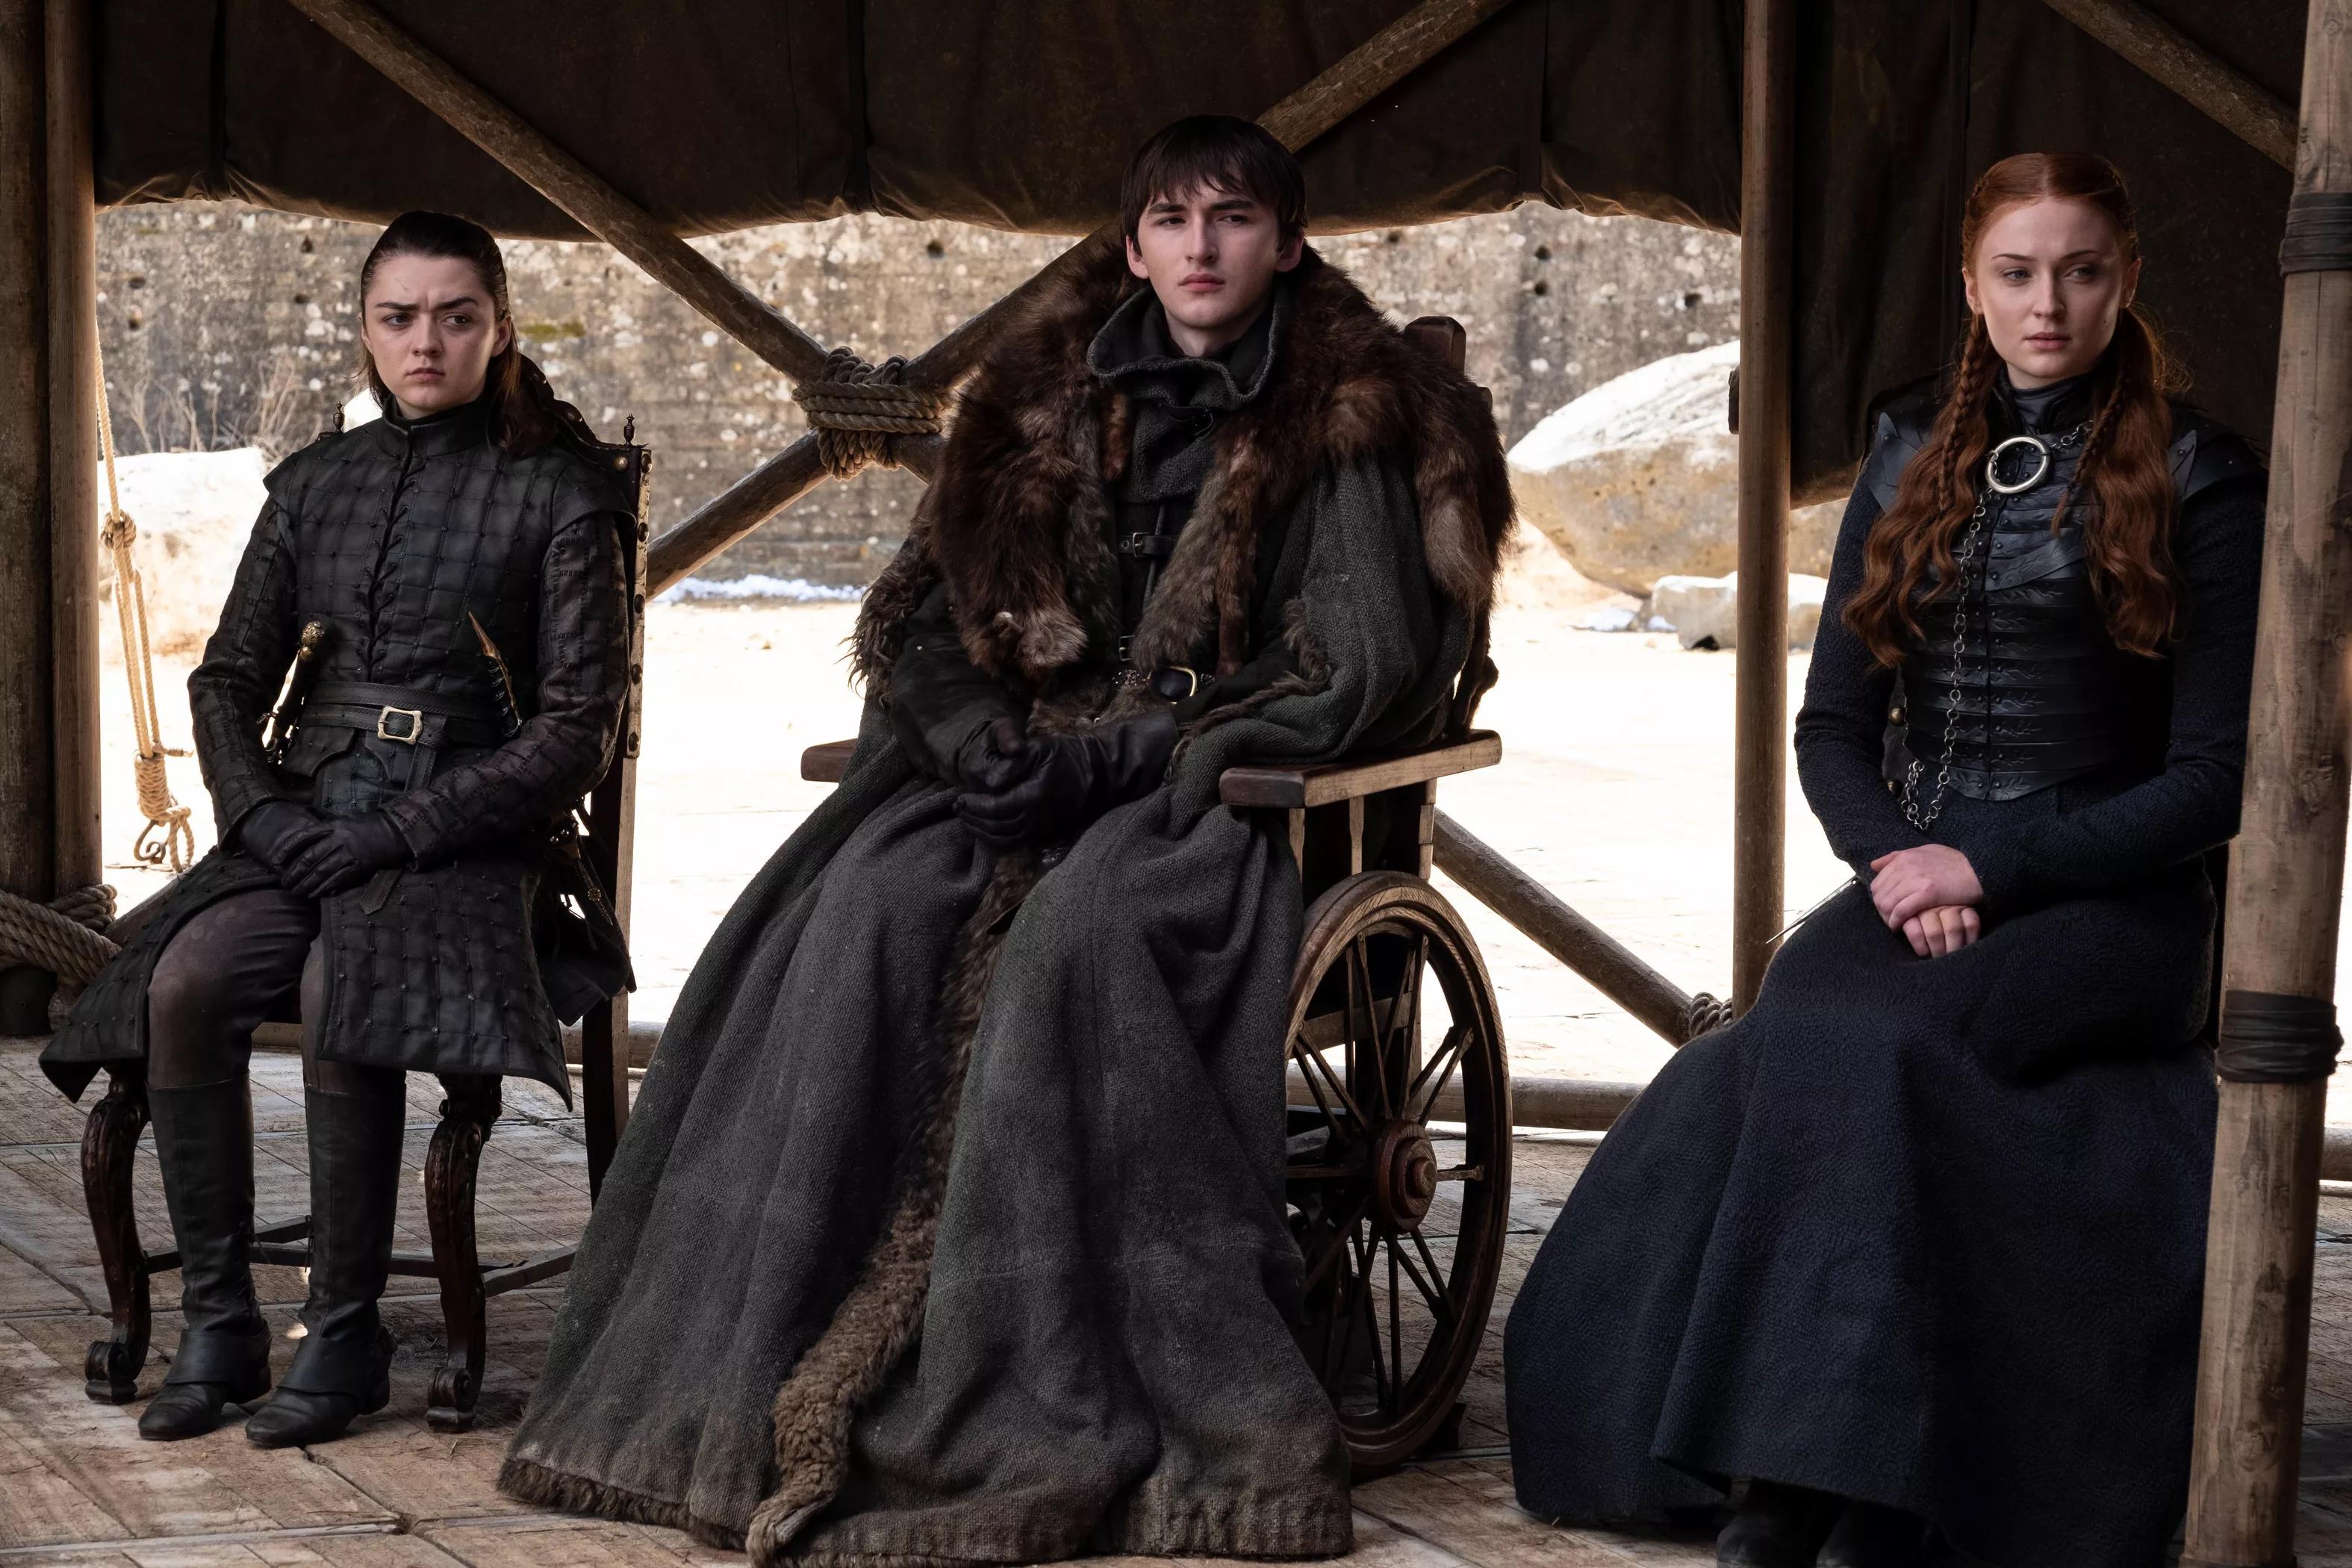 8x06 - The Iron सिंहासन - Arya, Bran and Sansa